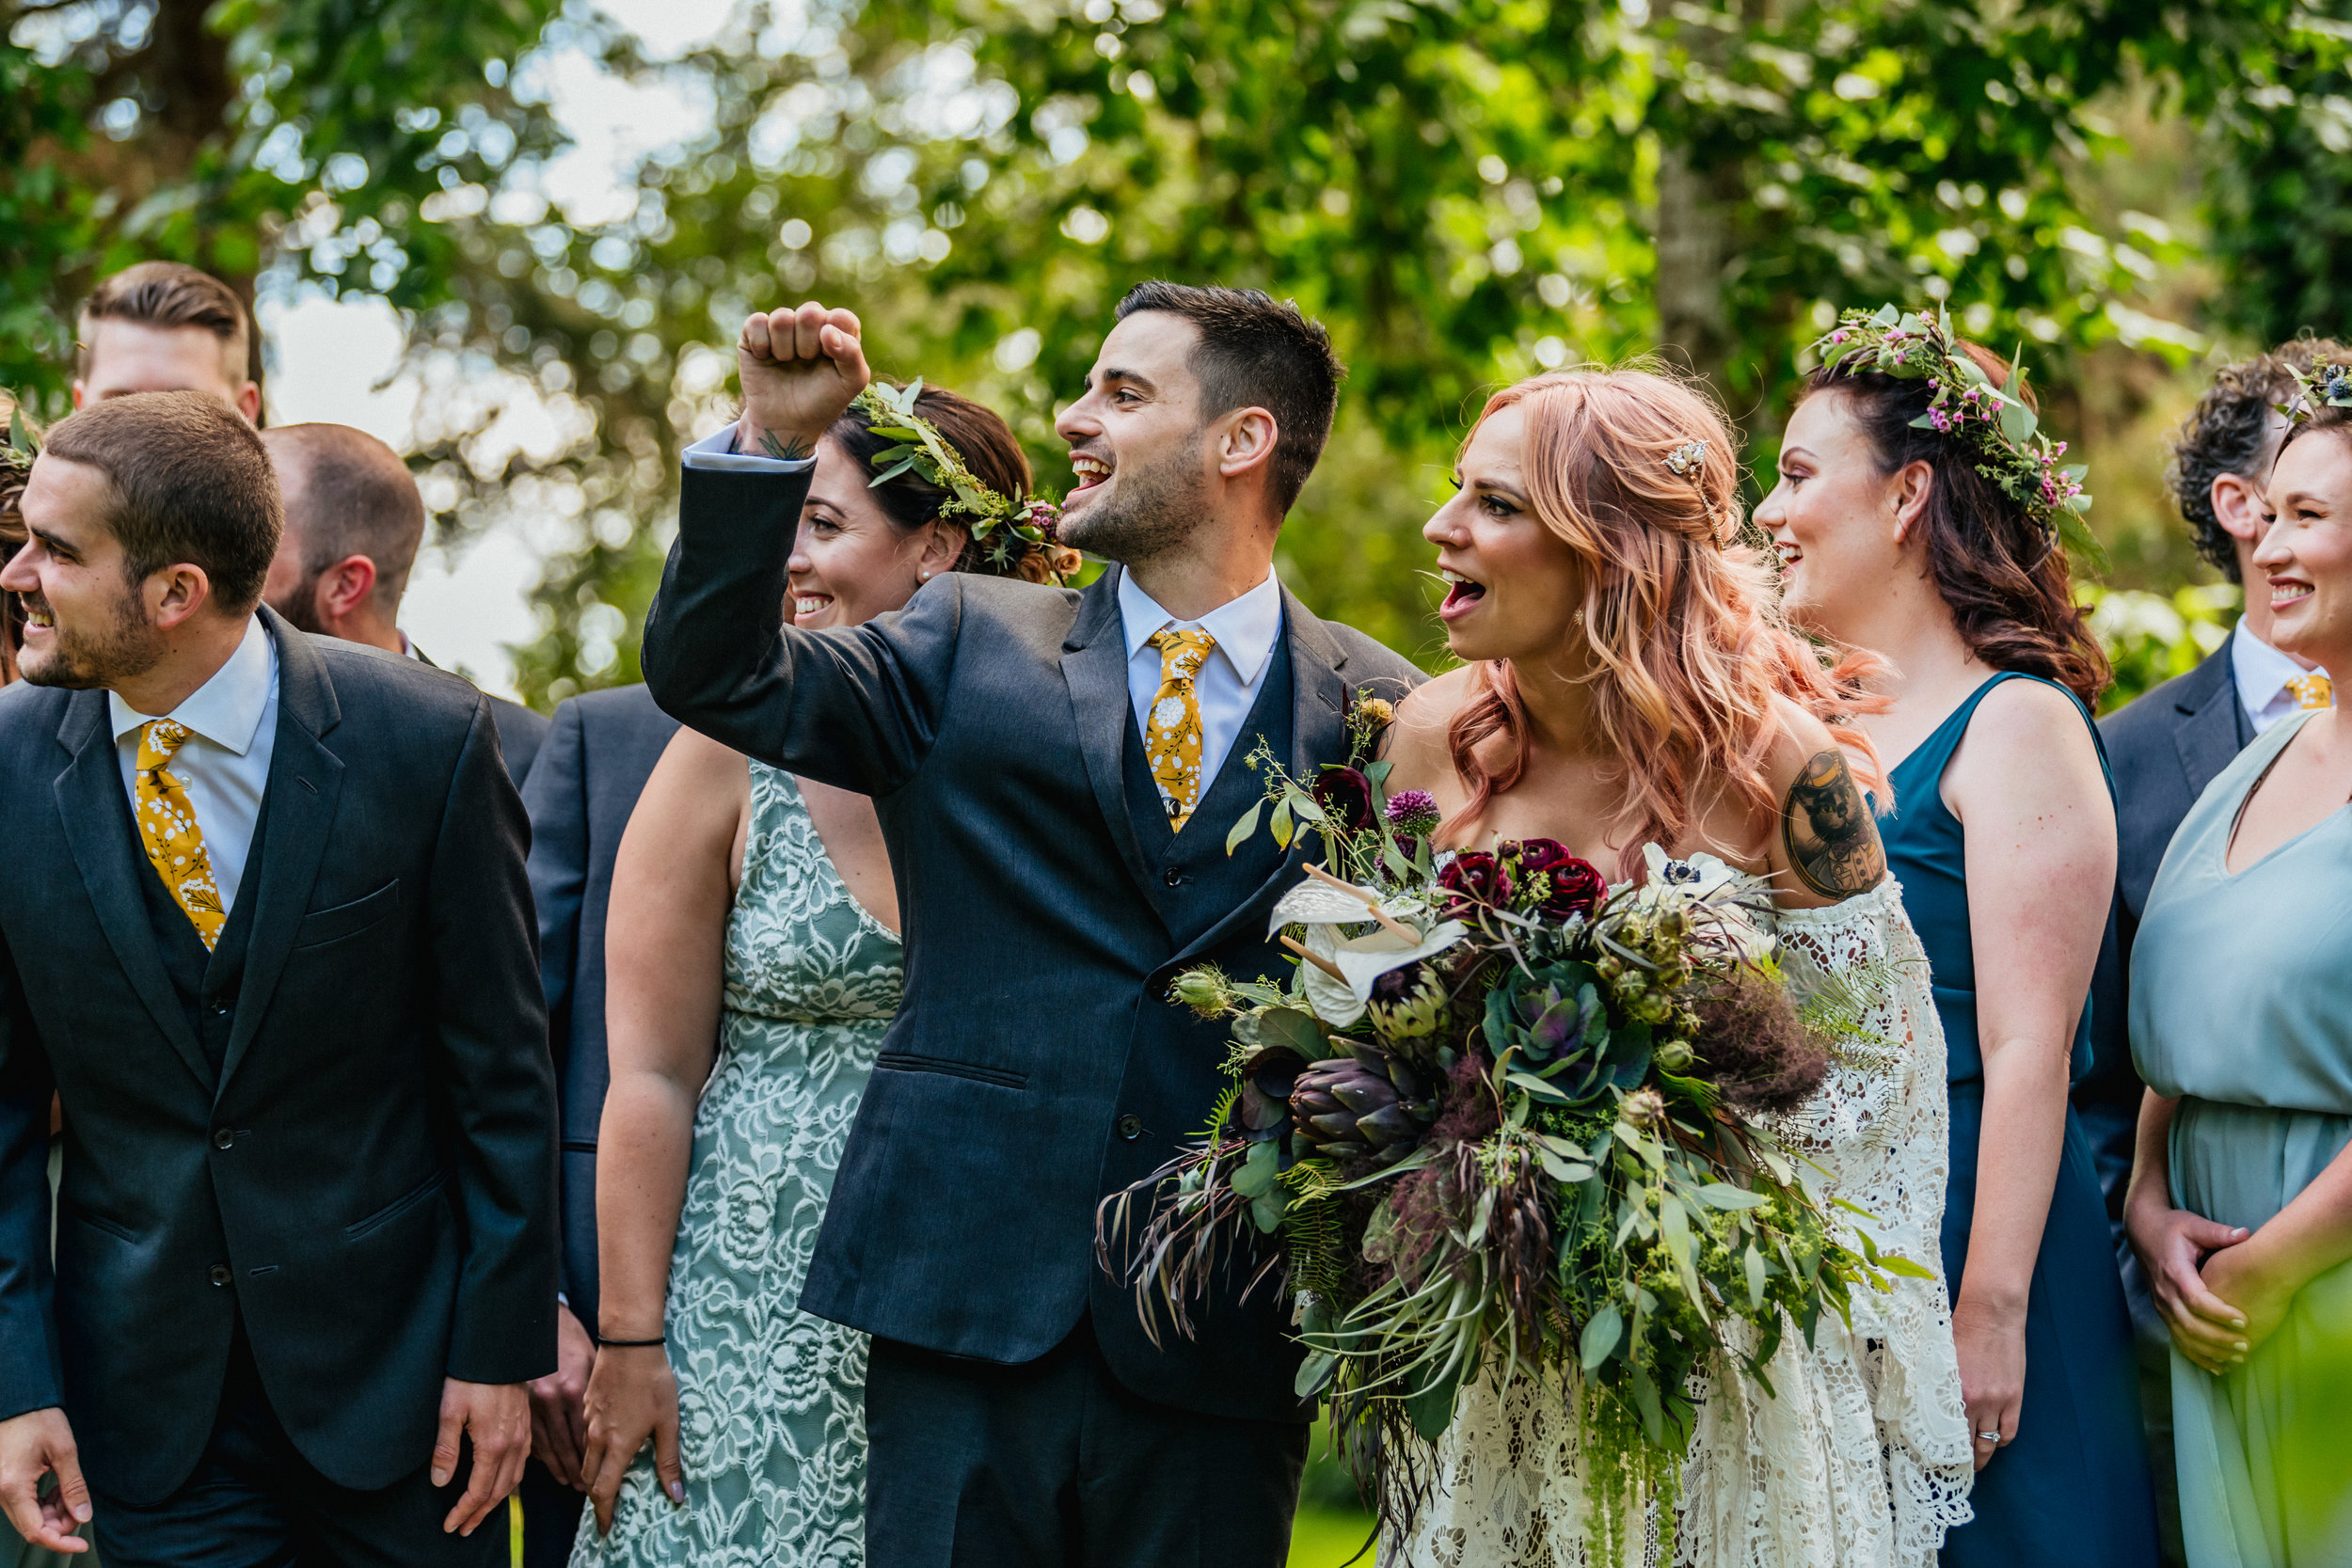 wedding florist florals design bloom generation san francisco oakland california